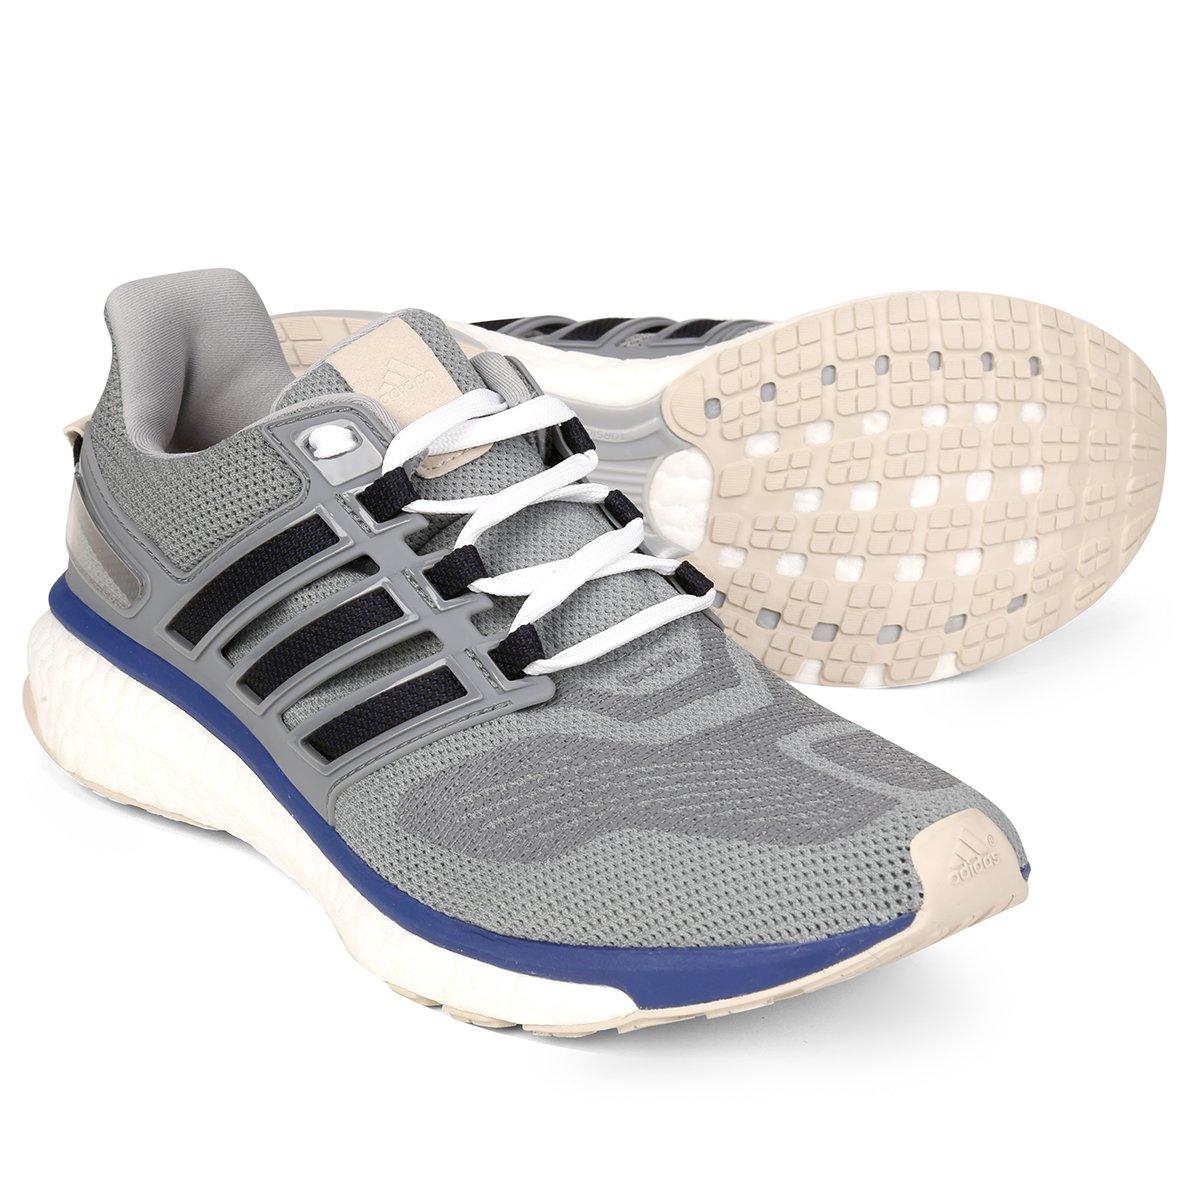 Tênis Adidas Energy Boost 3 Masculino - Cinza e Azul - Compre Agora ... c51b59d541b9e